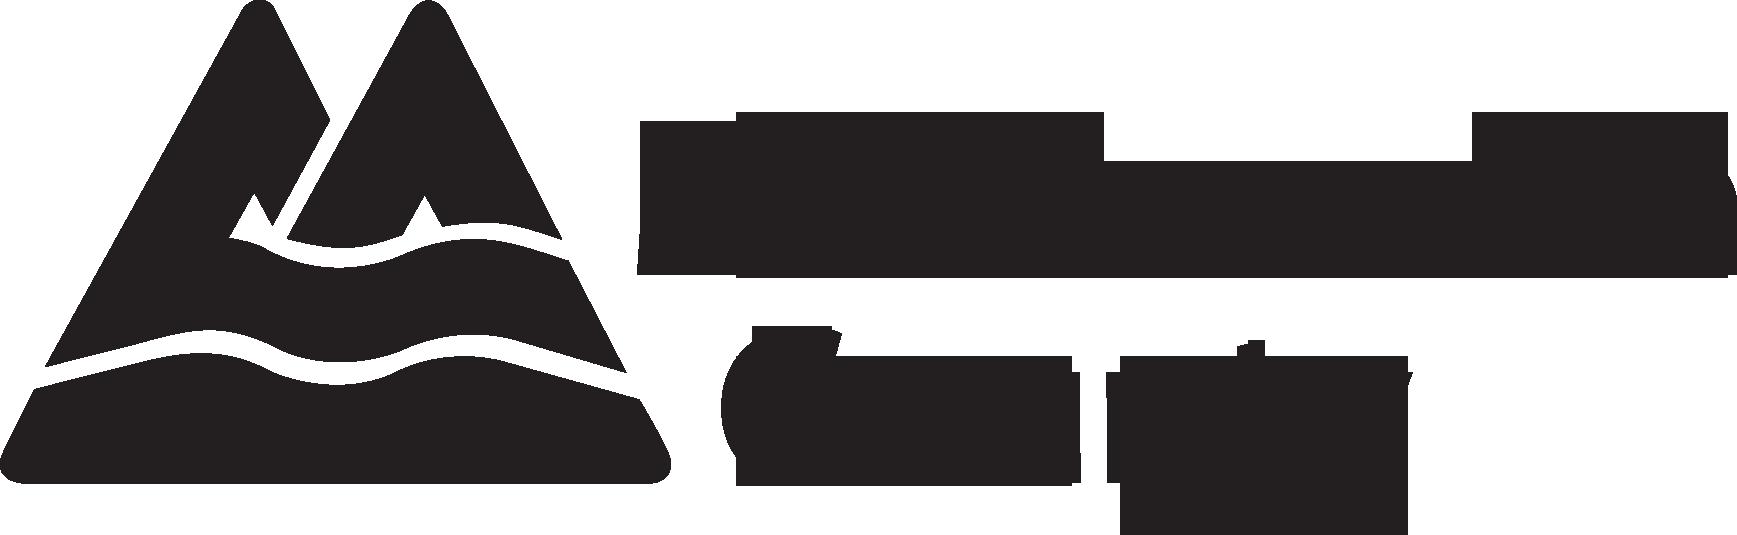 5a84c670a79cc multnomah county logo black 300